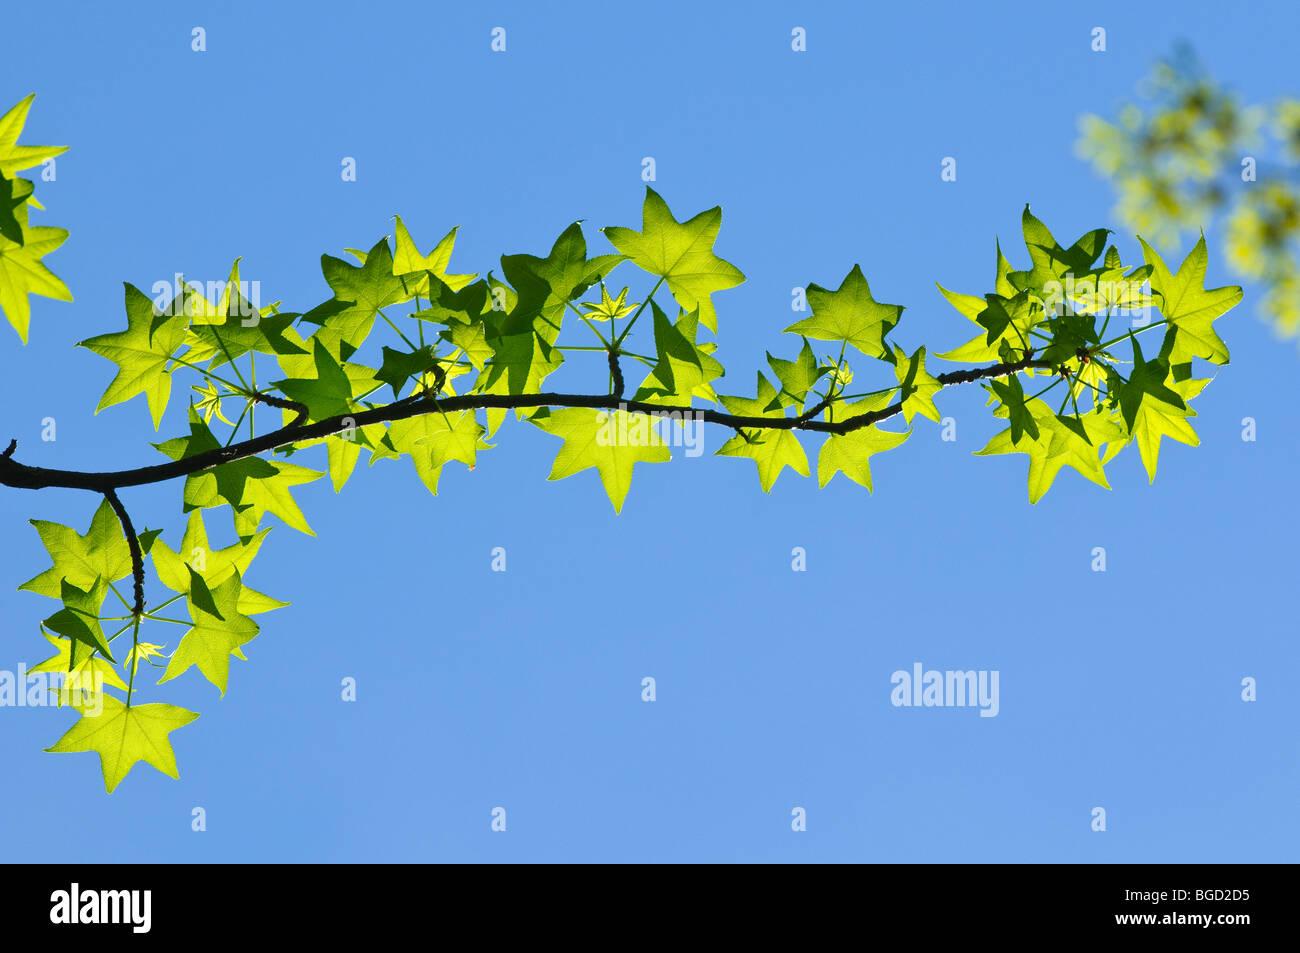 American Sweetgum tree leaves in early spring - Stock Image